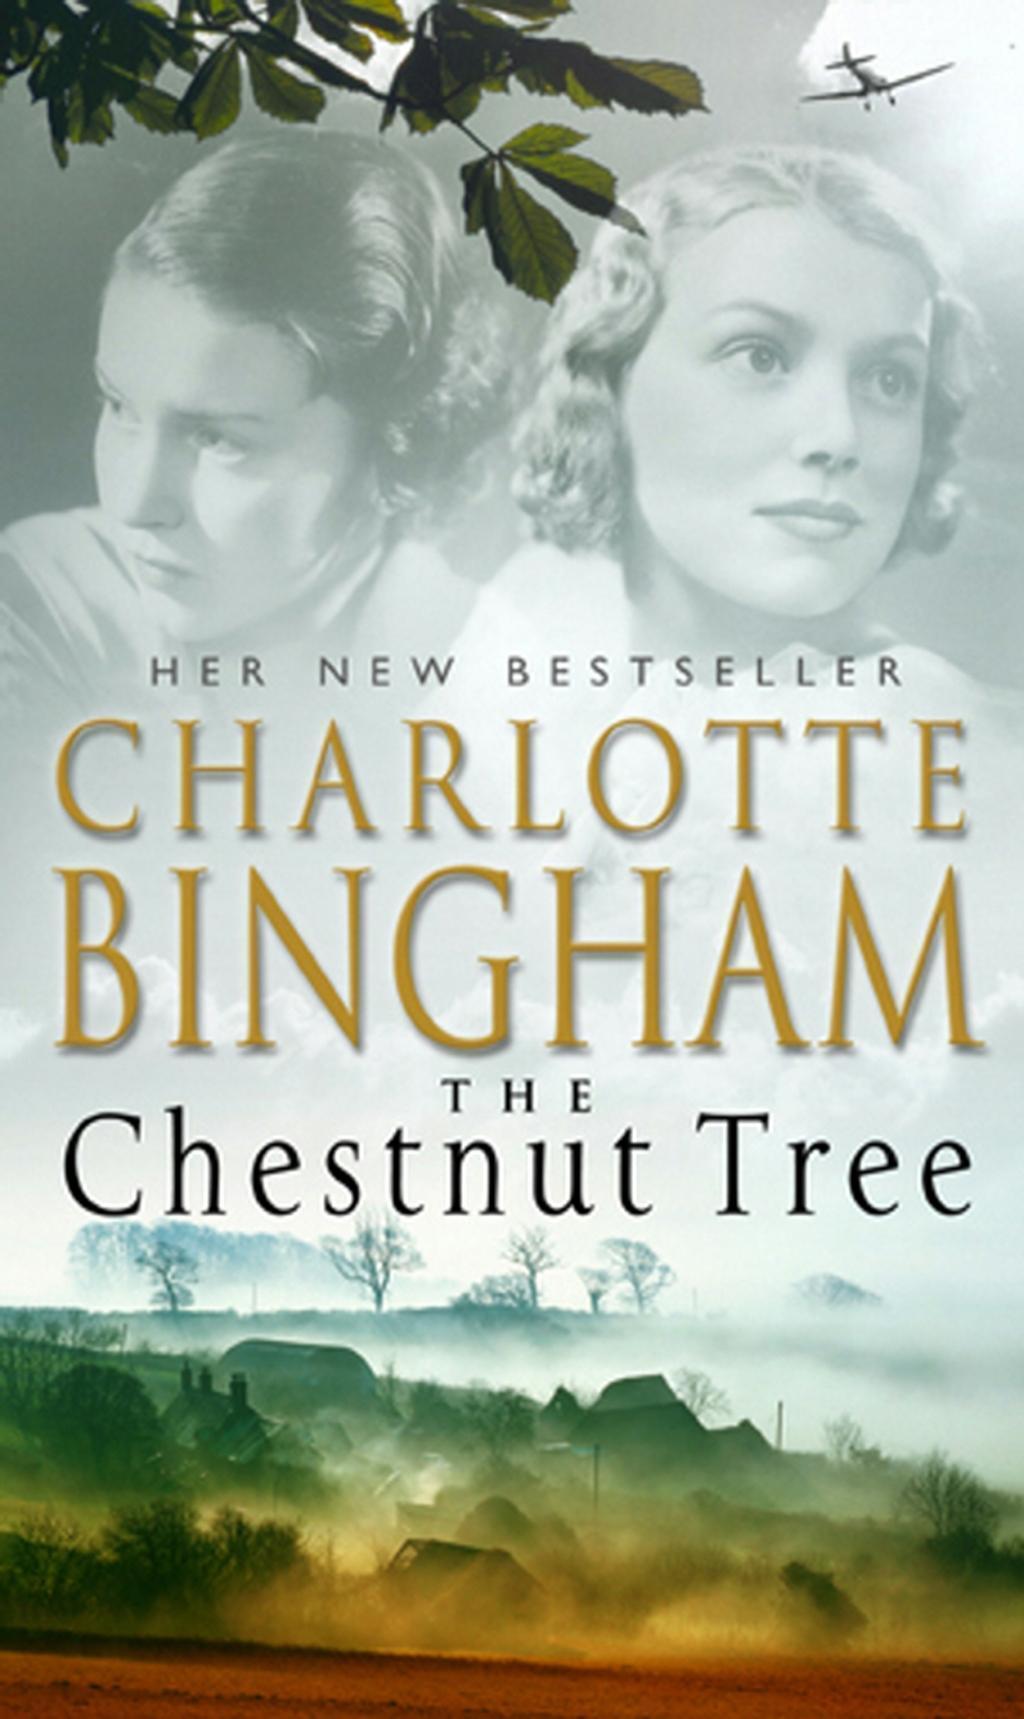 The Chestnut Tree